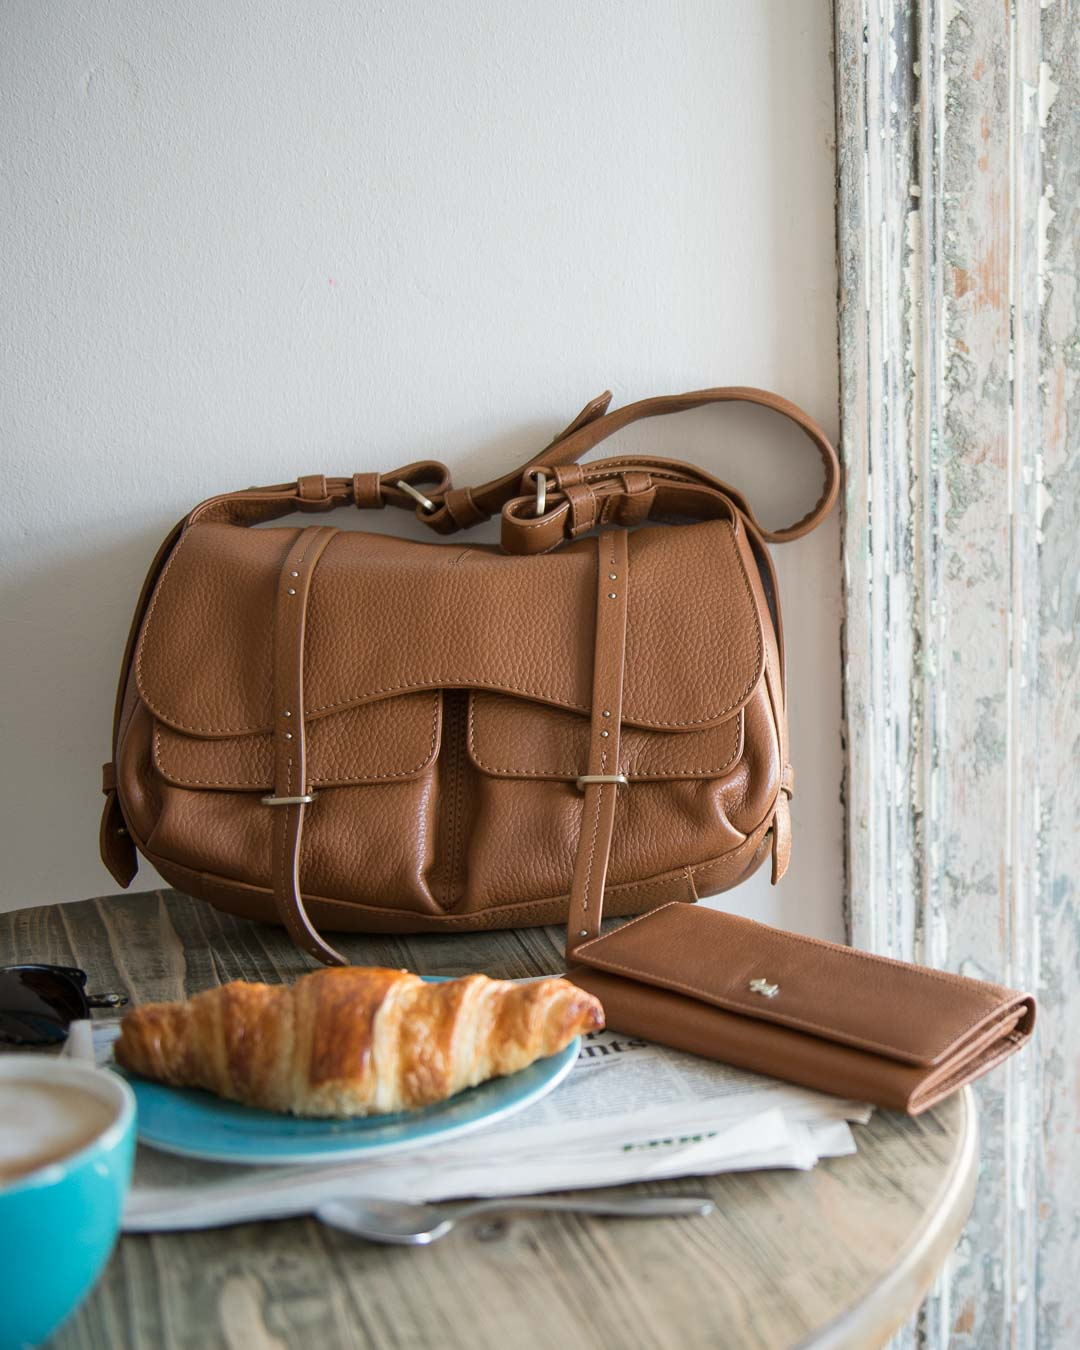 Radley leather handbag and purse in cafe scene